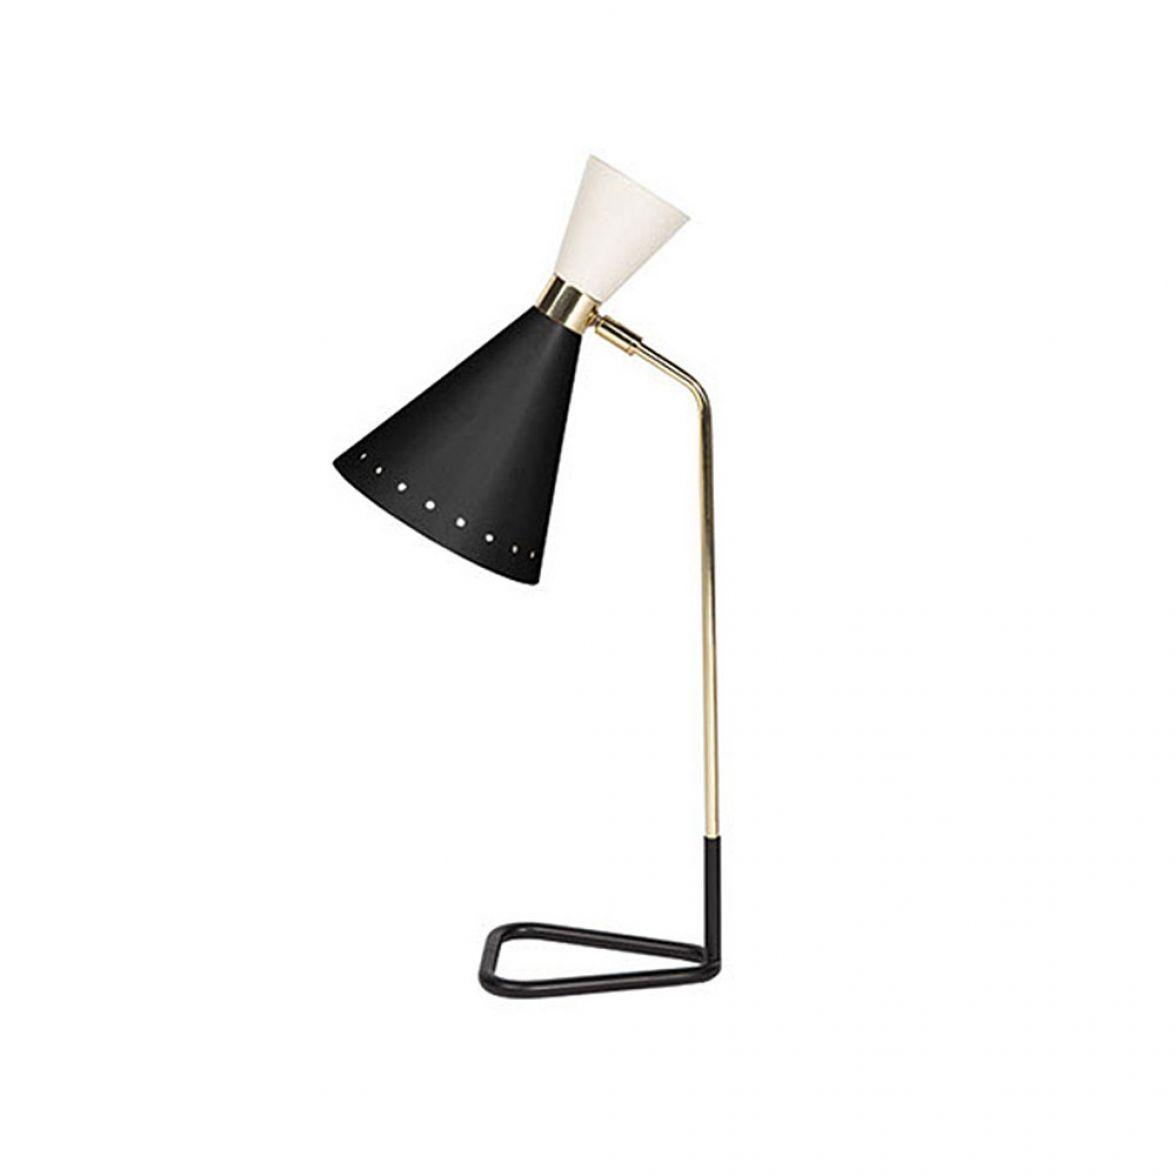 Milwaukee desk lamp